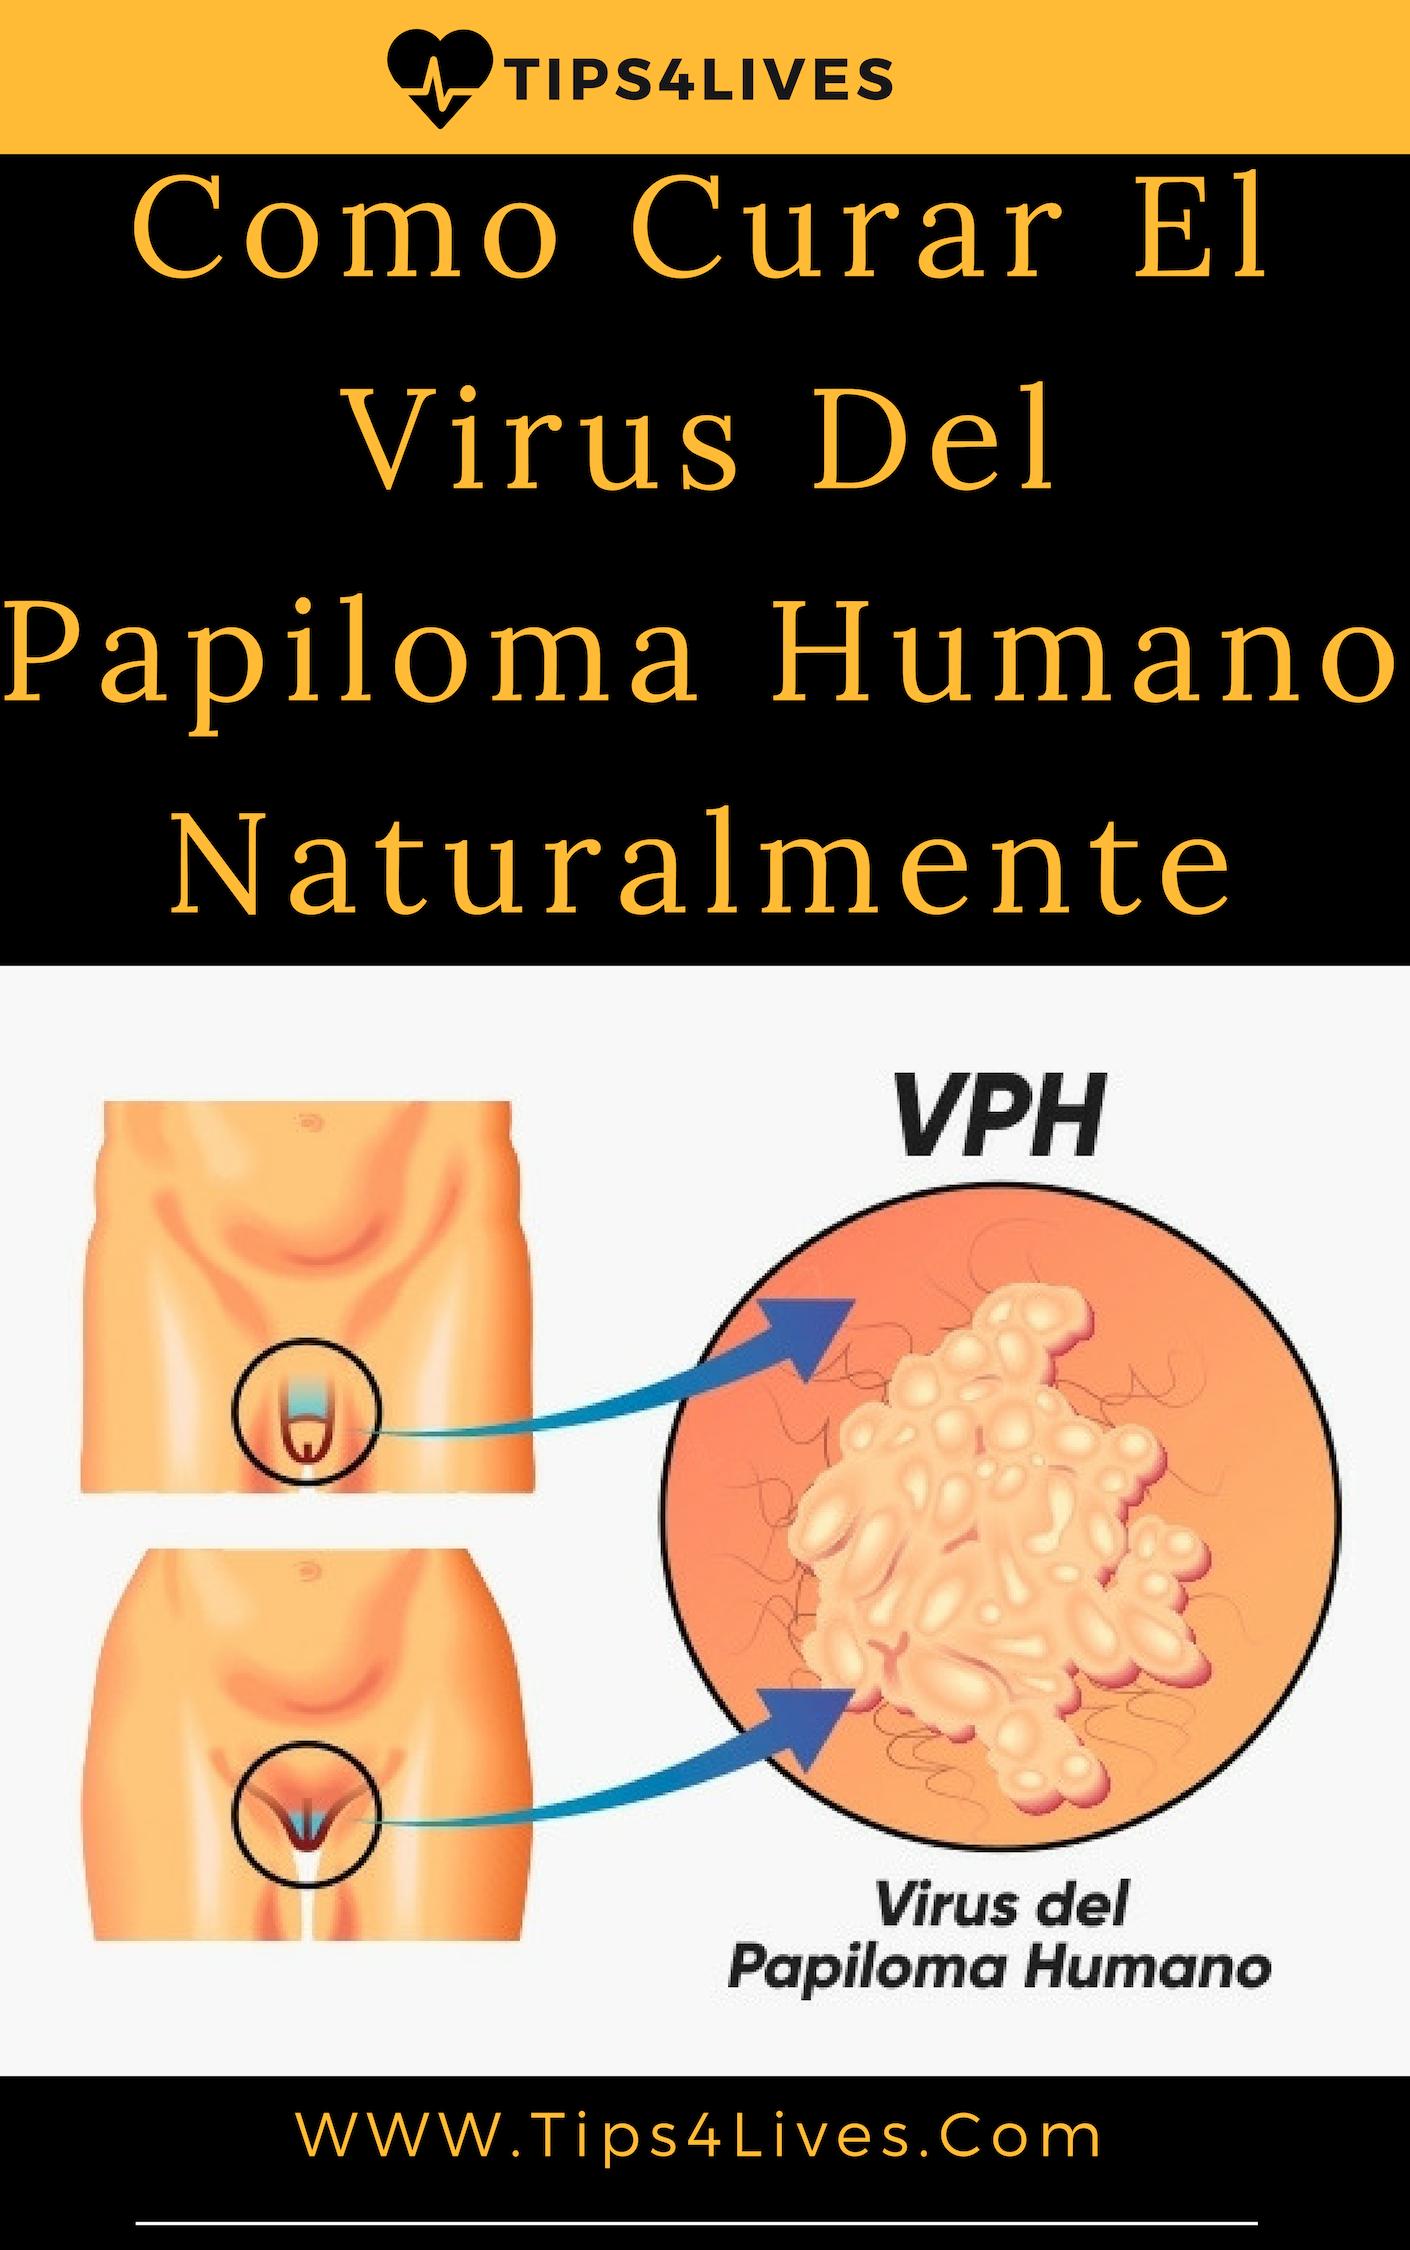 virus papiloma humano mujeres causas papillomas and lung cancer